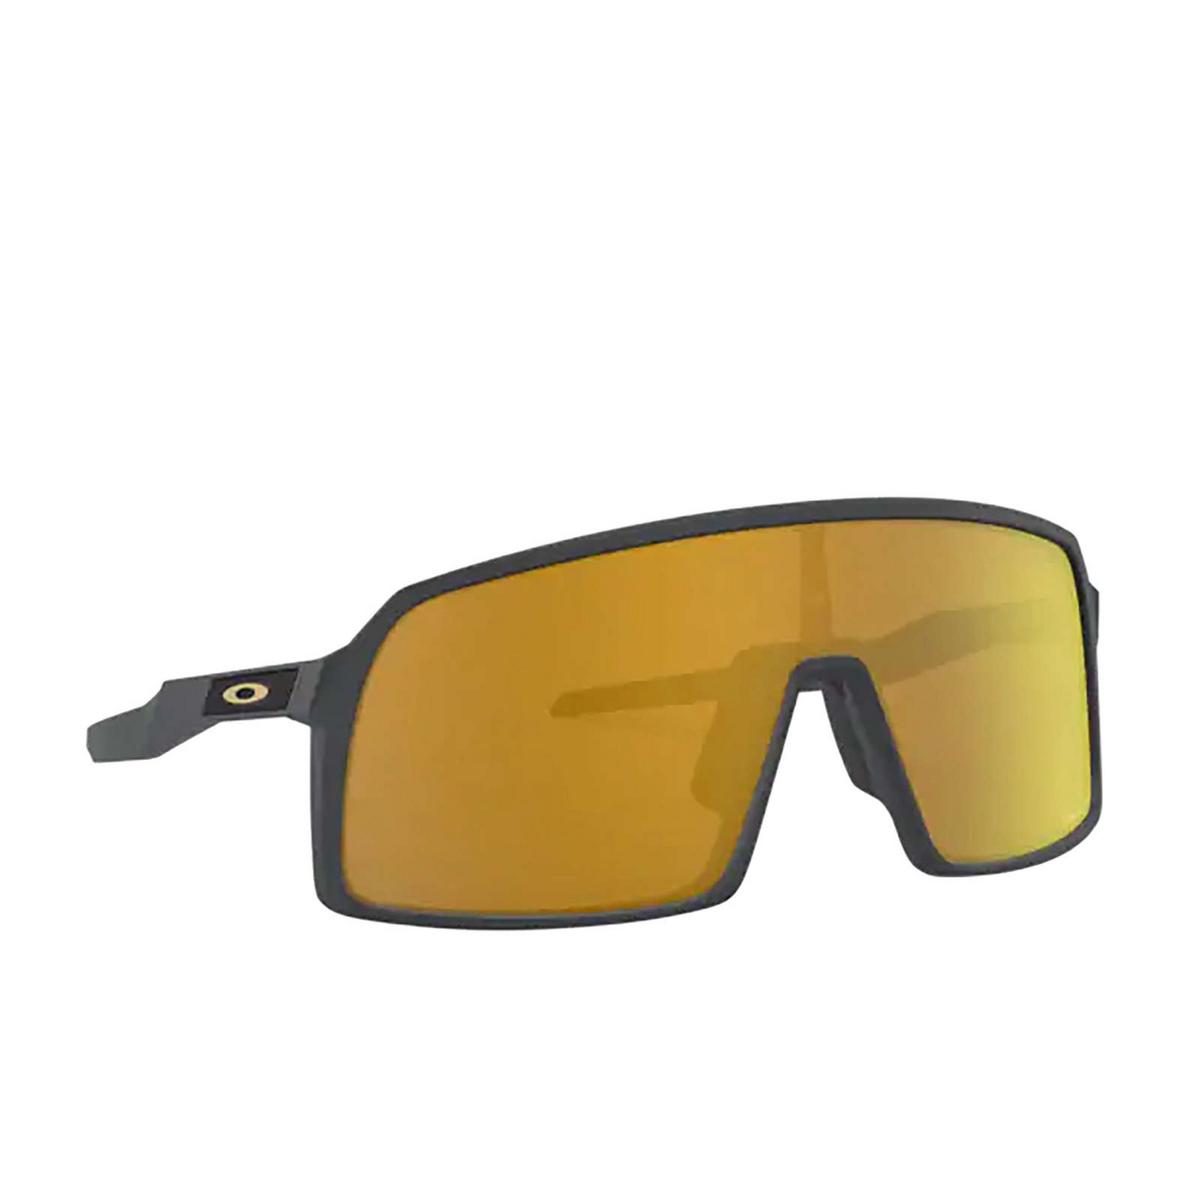 Oakley® Sport Sunglasses: Sutro OO9406 color Matte Carbon 940605 - three-quarters view.